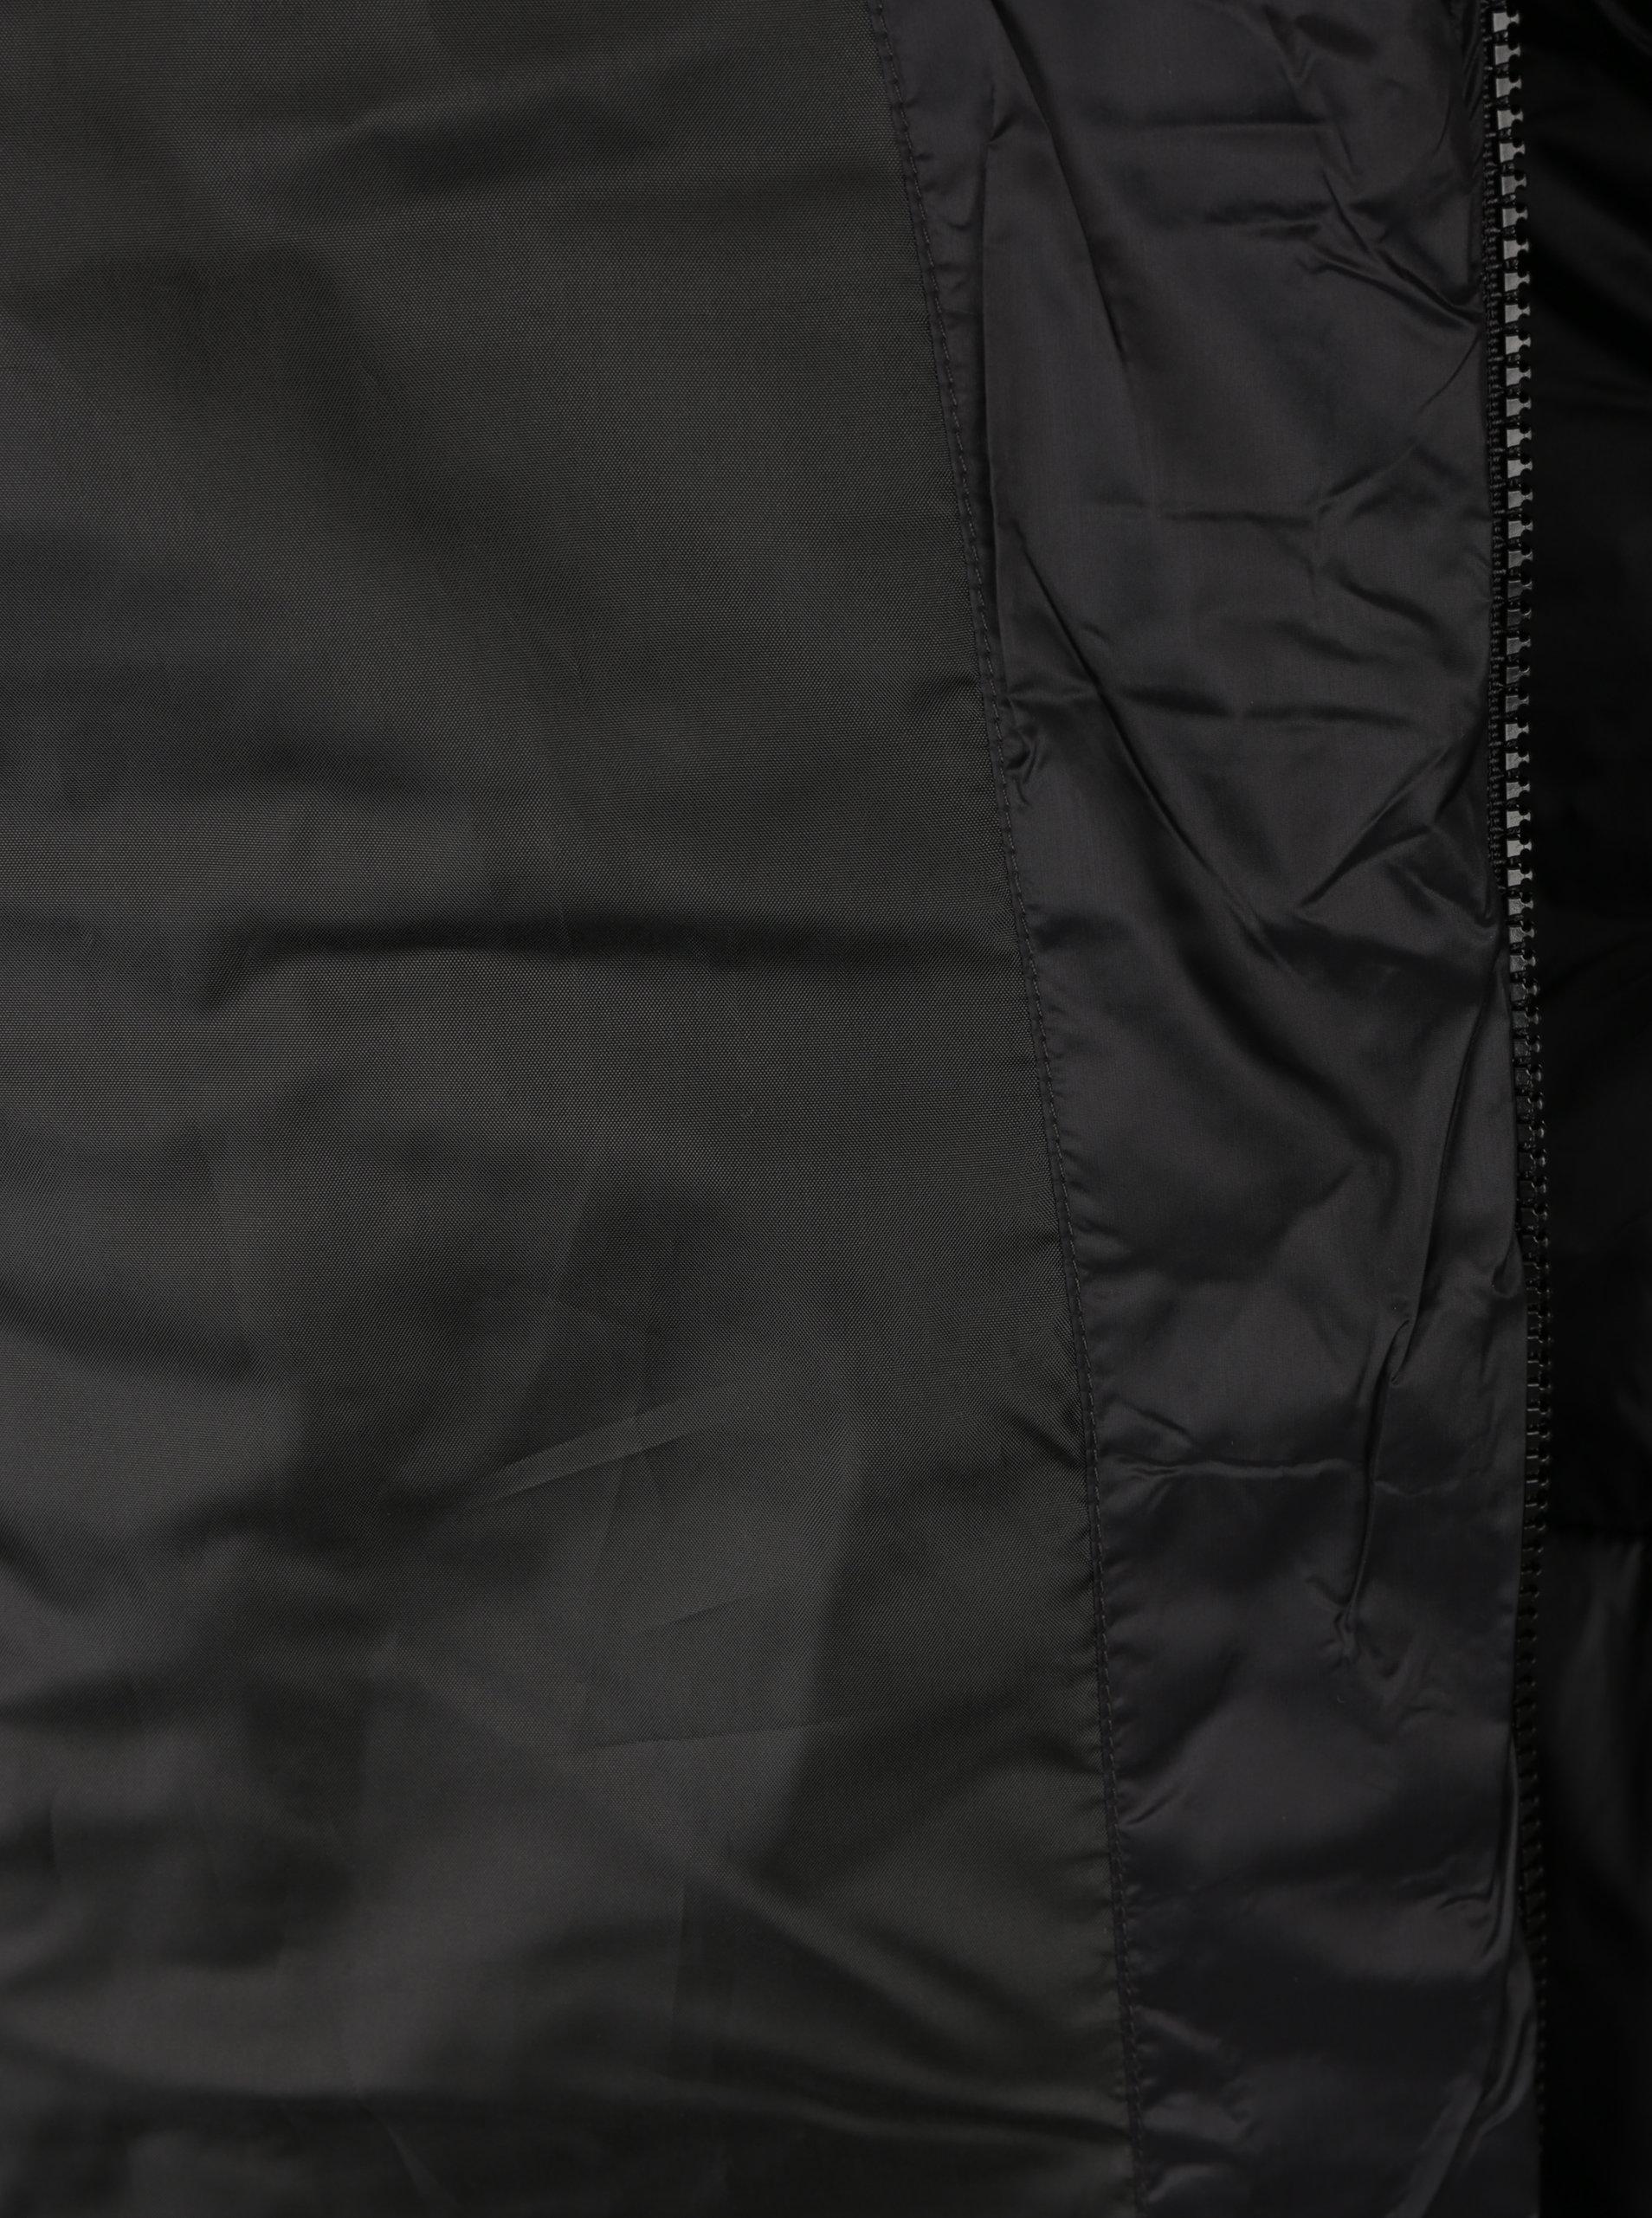 Čierny dlhý prešívaný kabát s kapucňou ONLY Naja ... d2c5d25ed4d